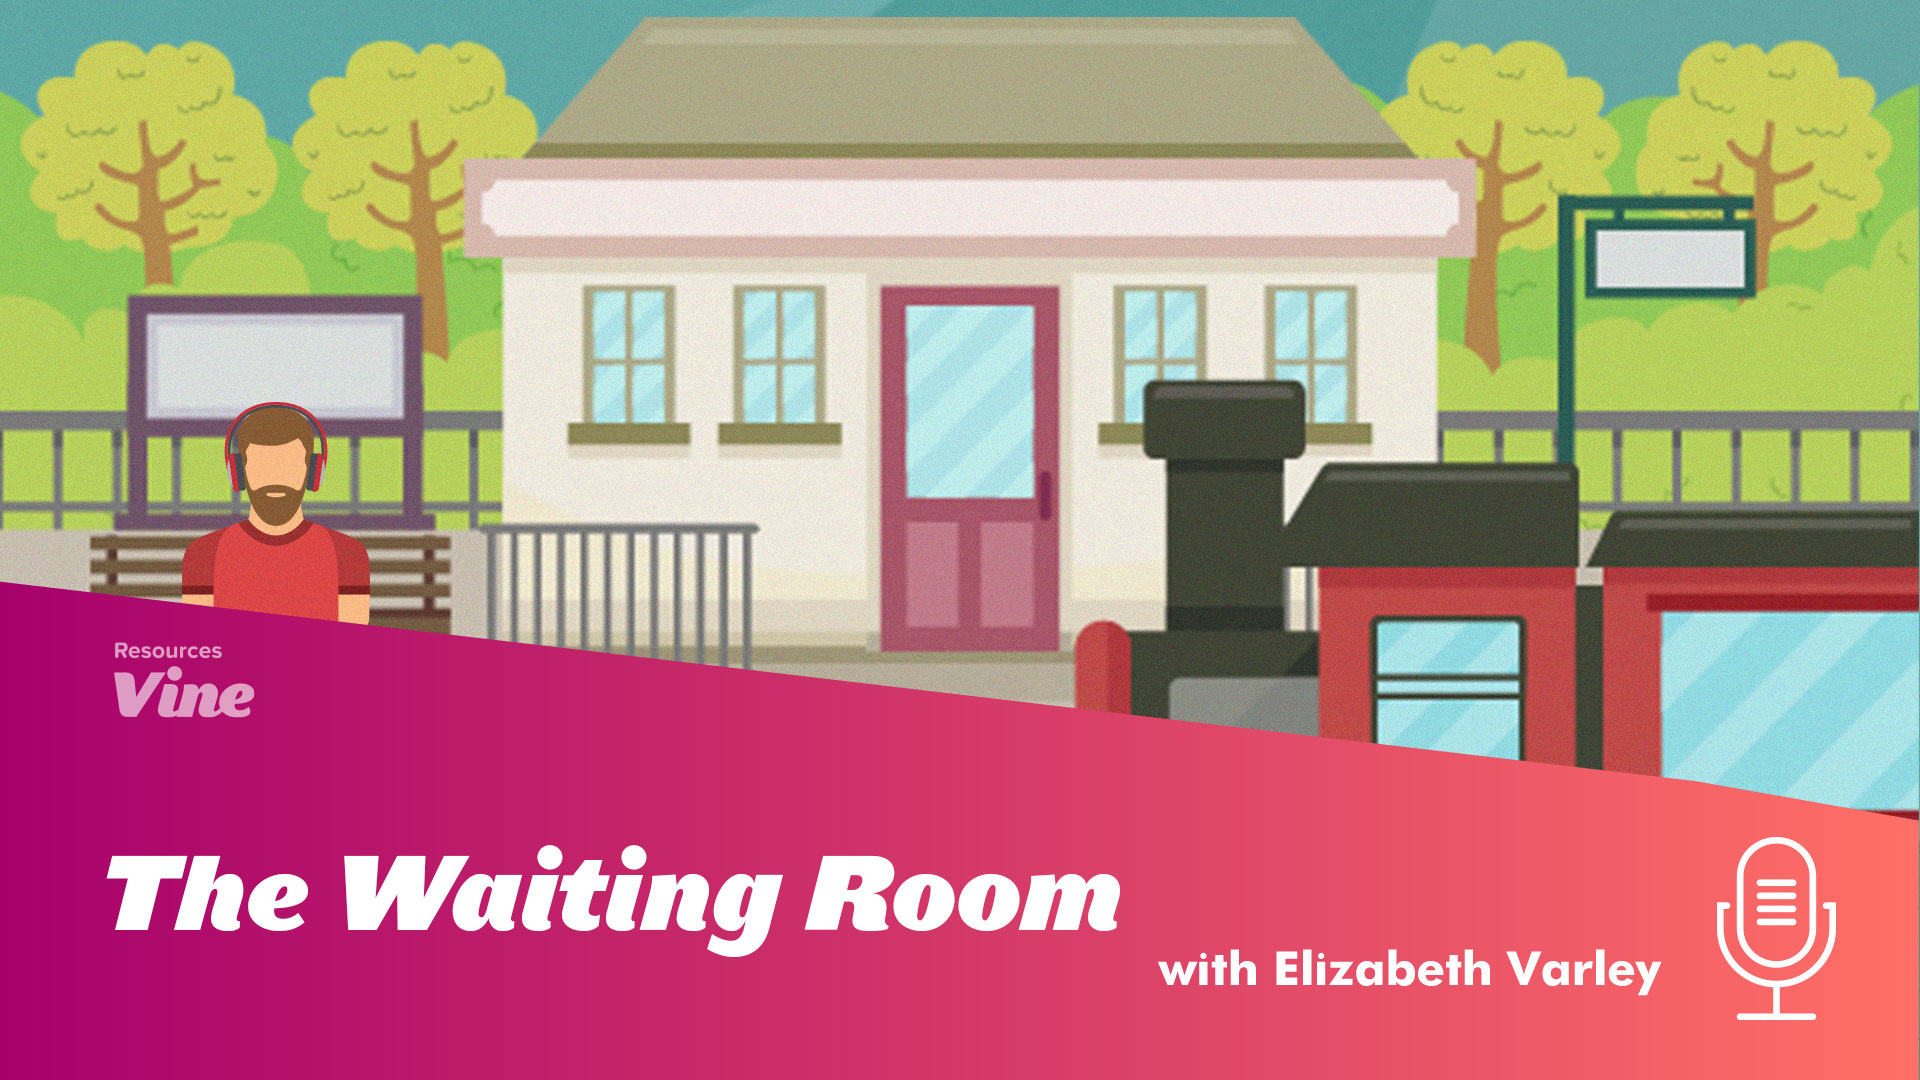 Thumbnail_The_Waiting_Room_Elizabeth Varley